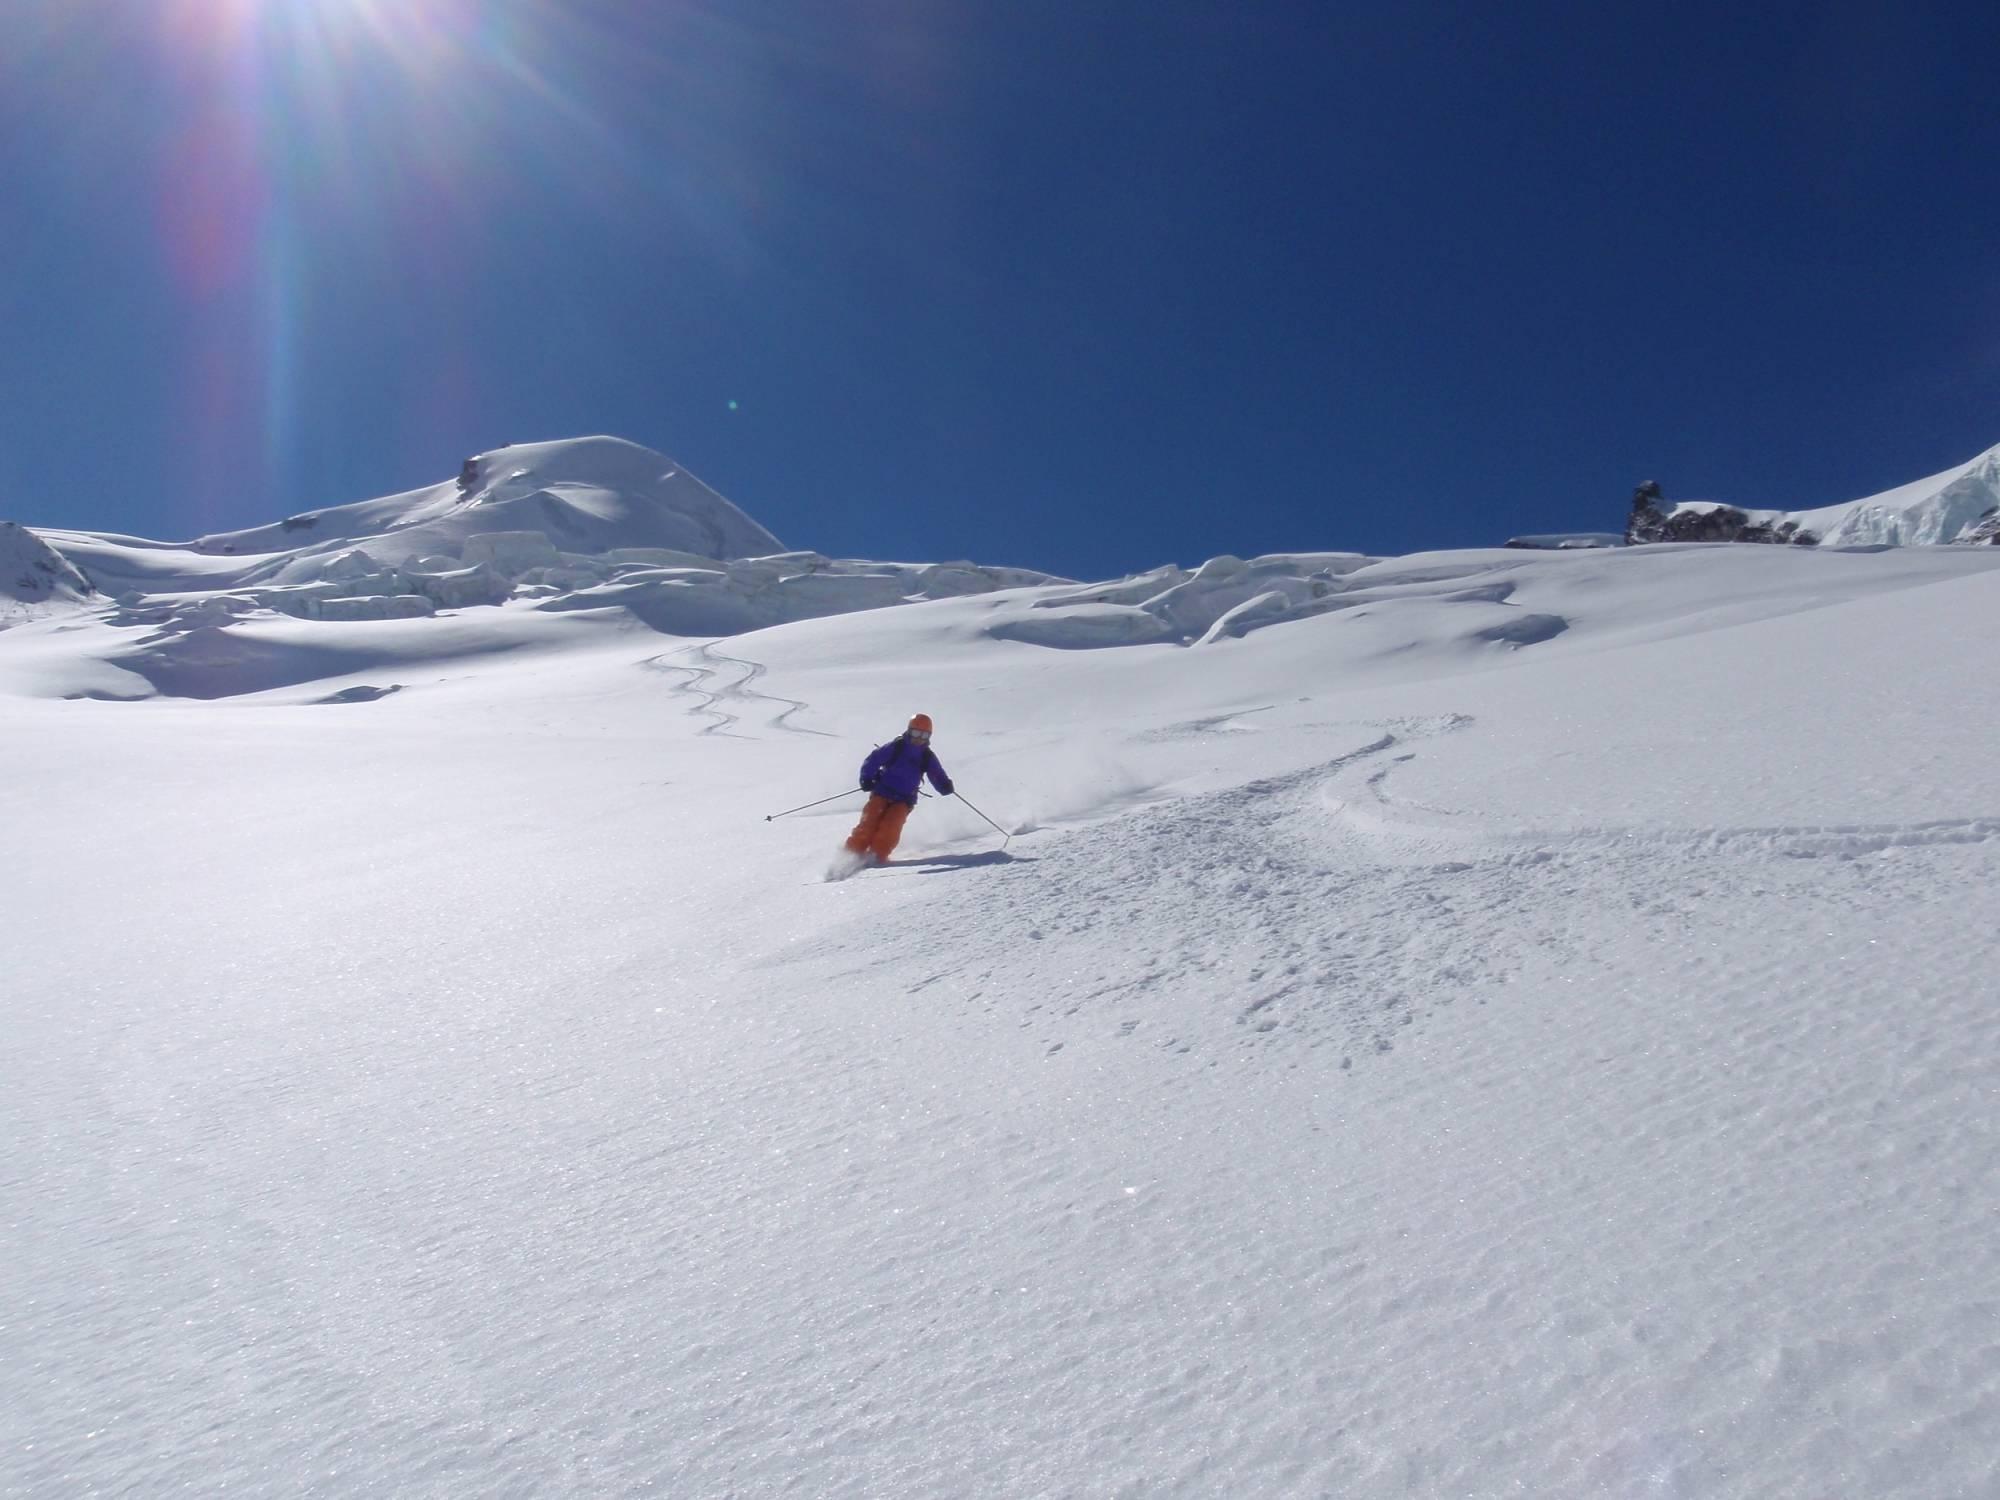 Klettergurt Skitouren : St jodok schmirn vals skitouren